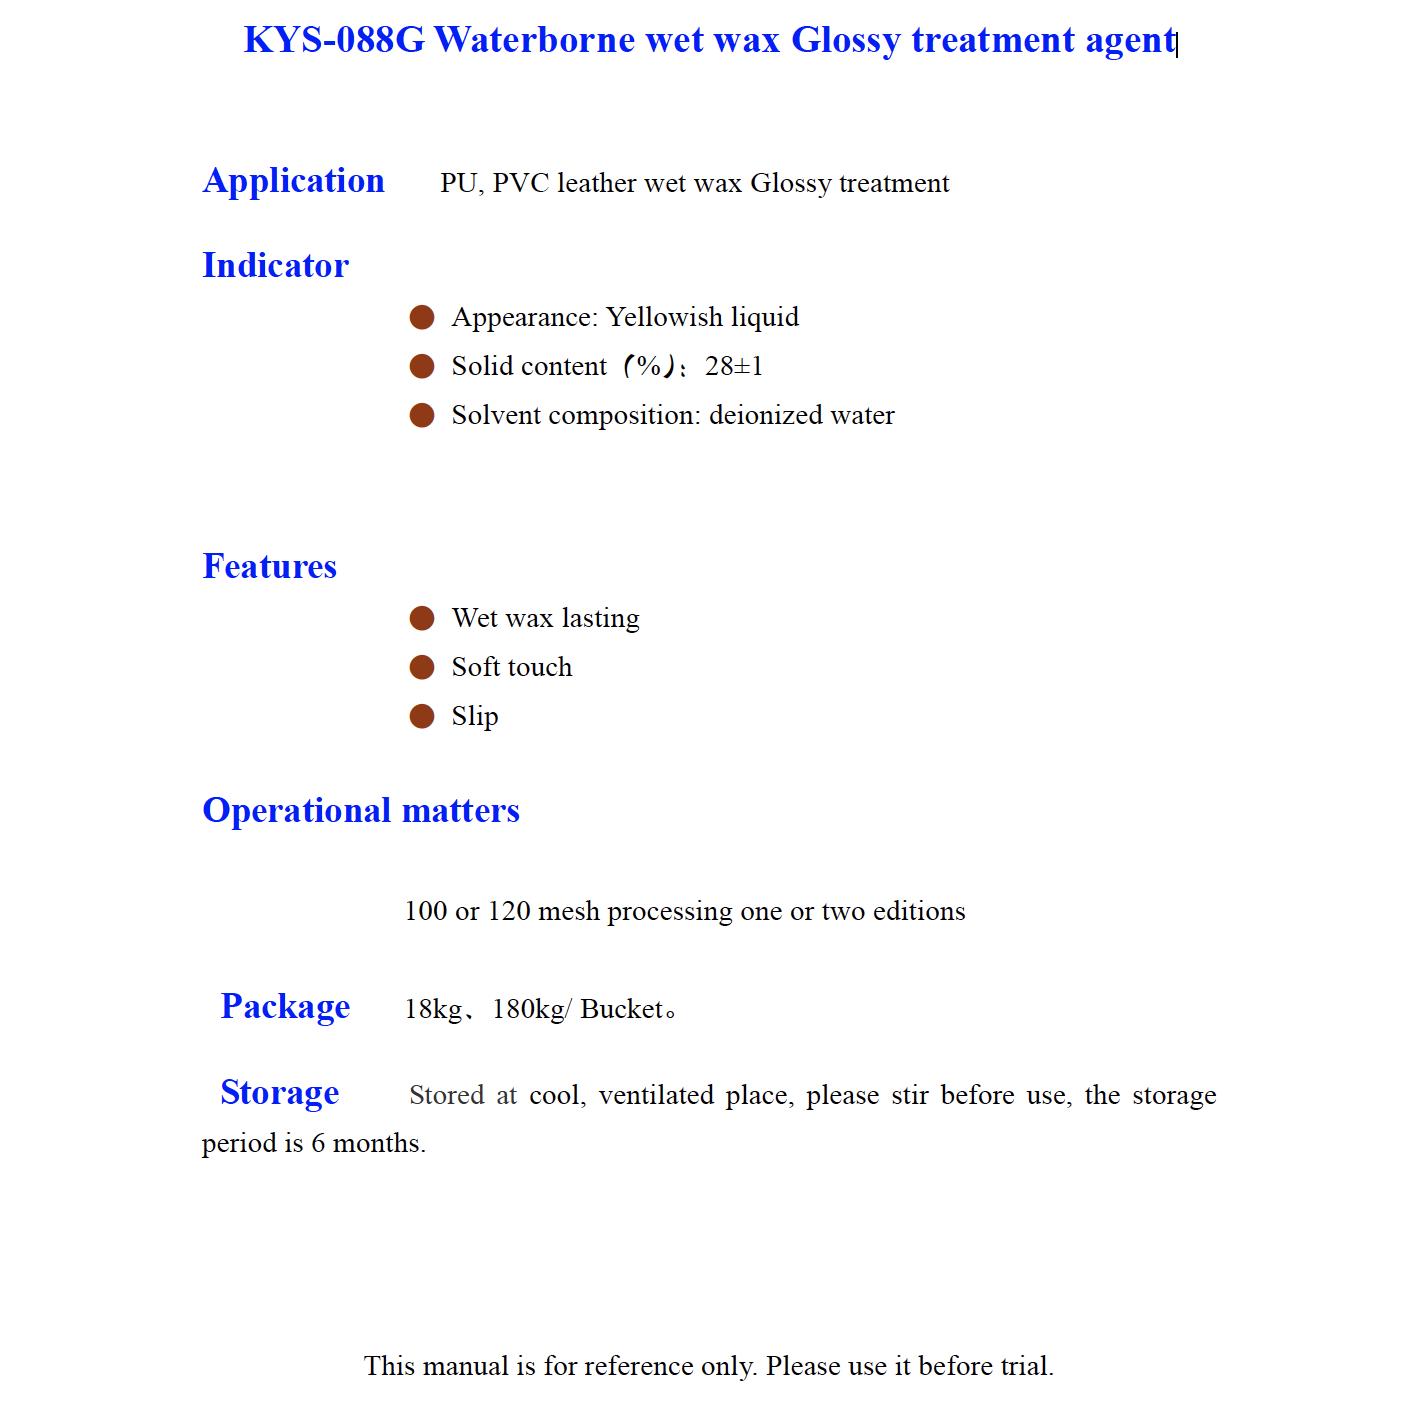 K YS 088G Waterborne wet wax Glossy treatment agent